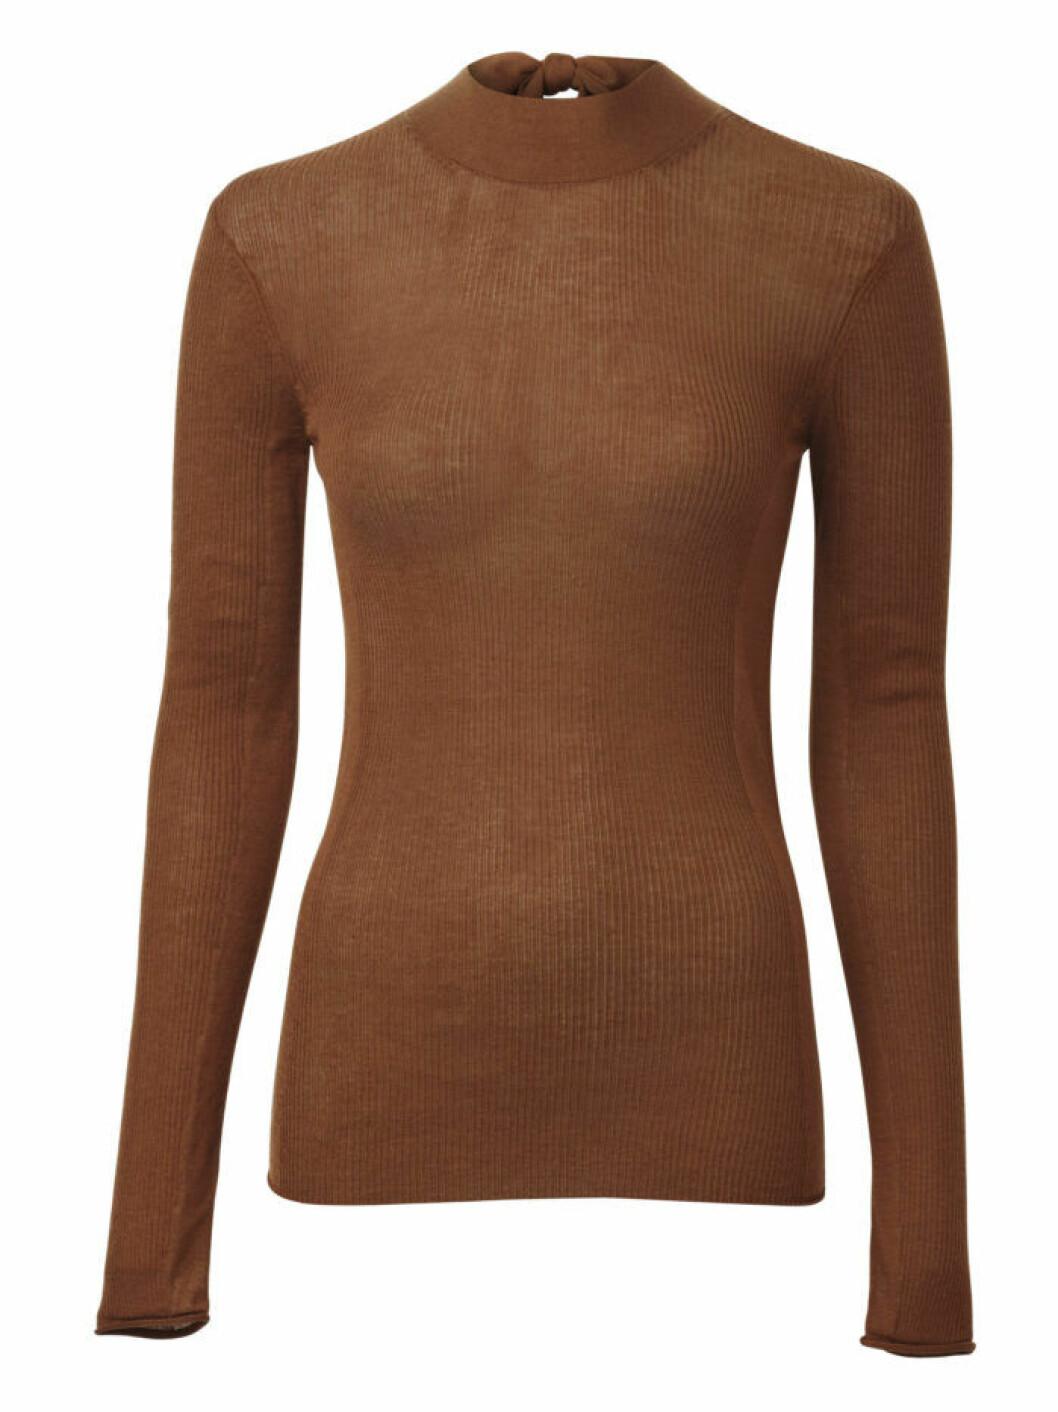 Stickad tröja i brunt